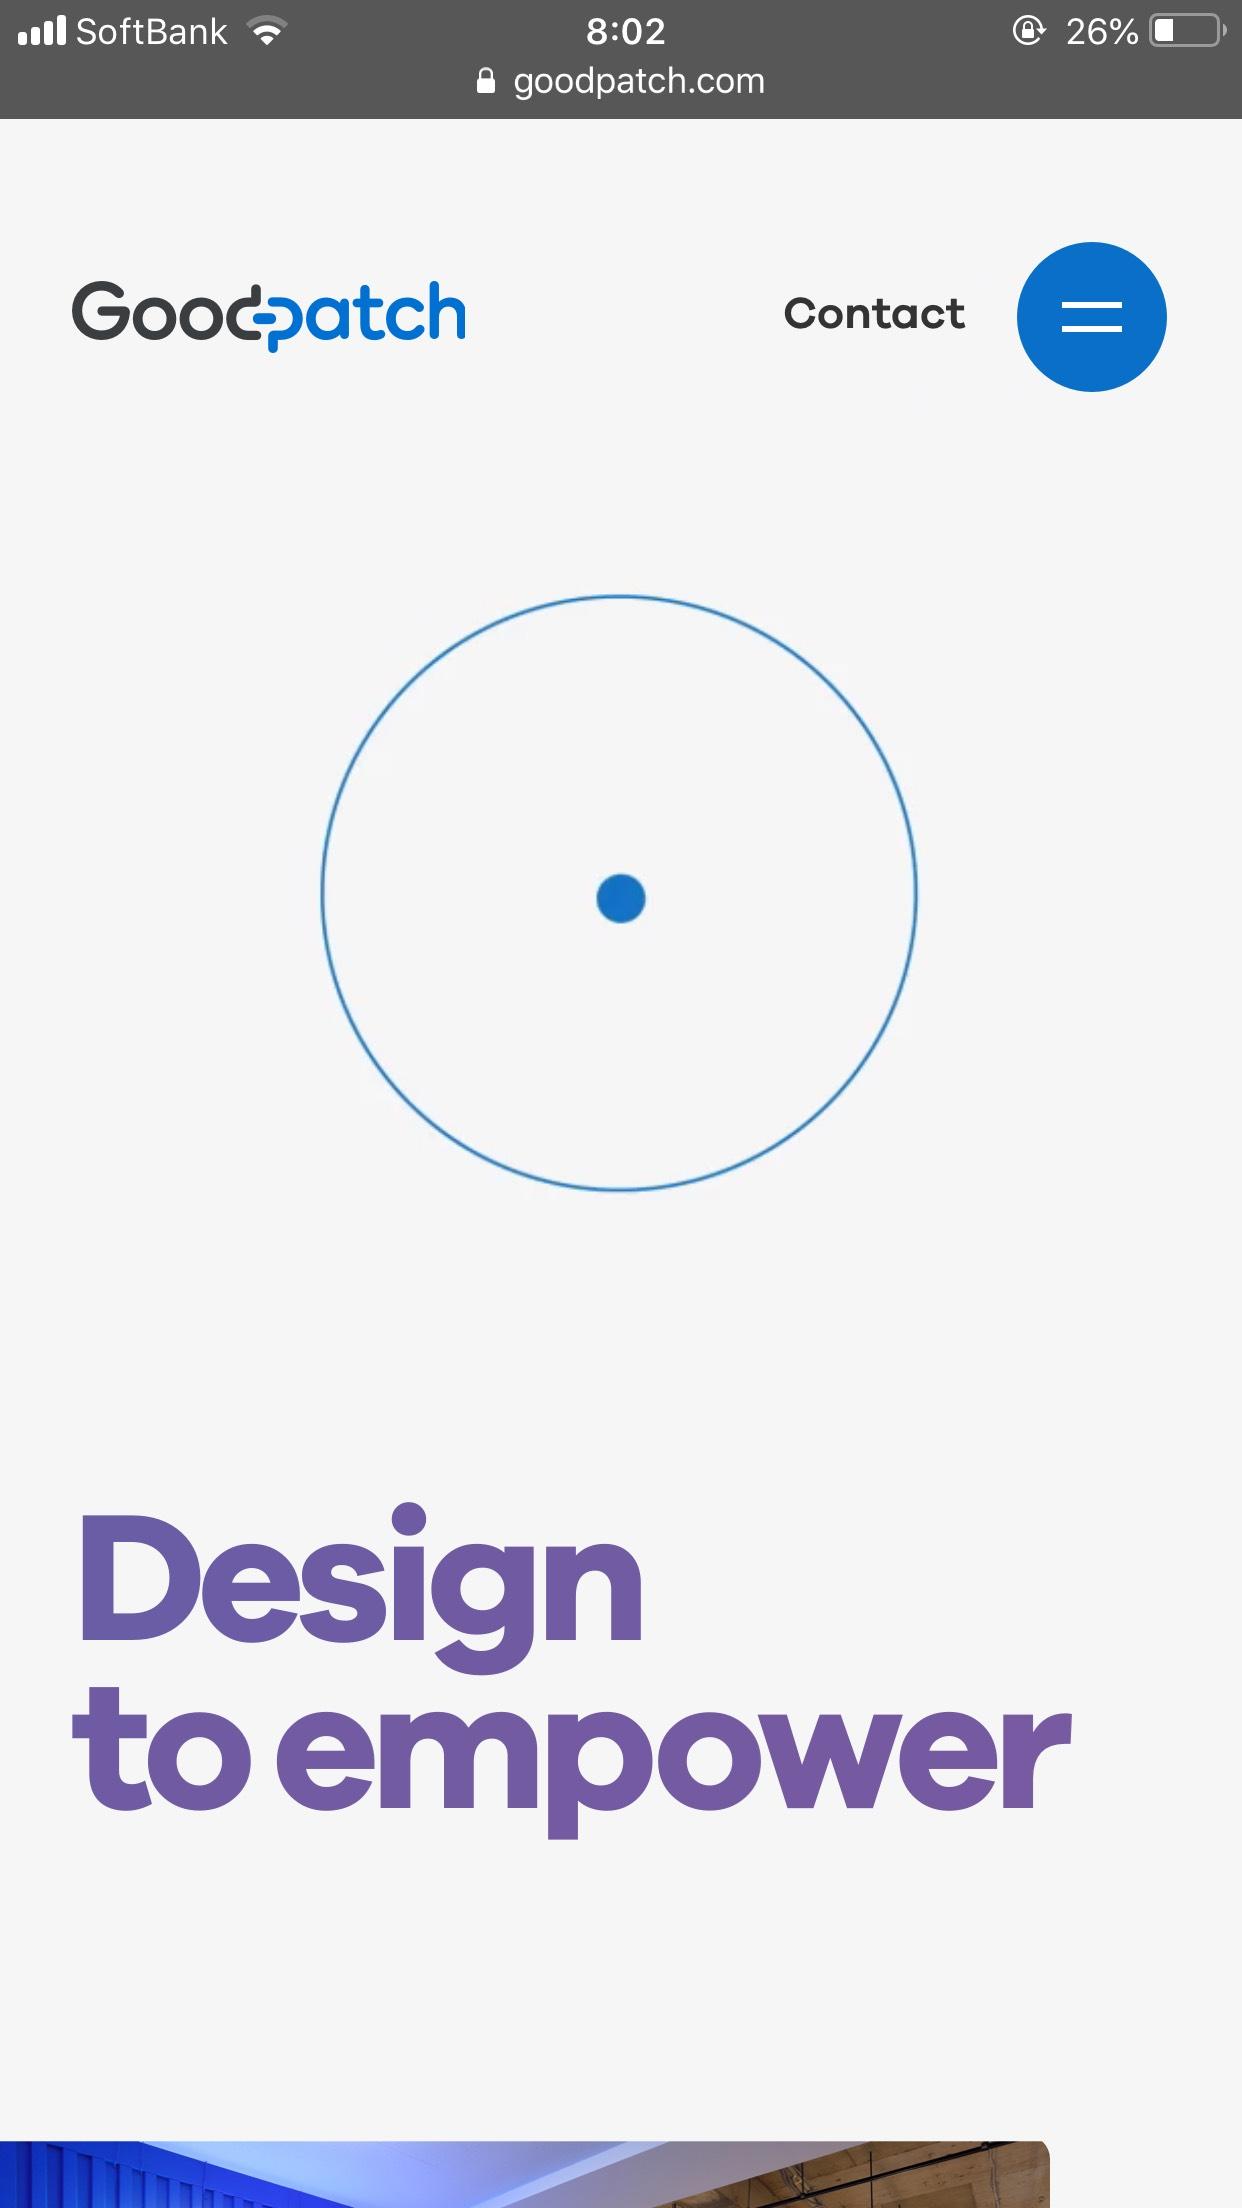 Goodpatch グッドパッチ|デザインの力を証明する